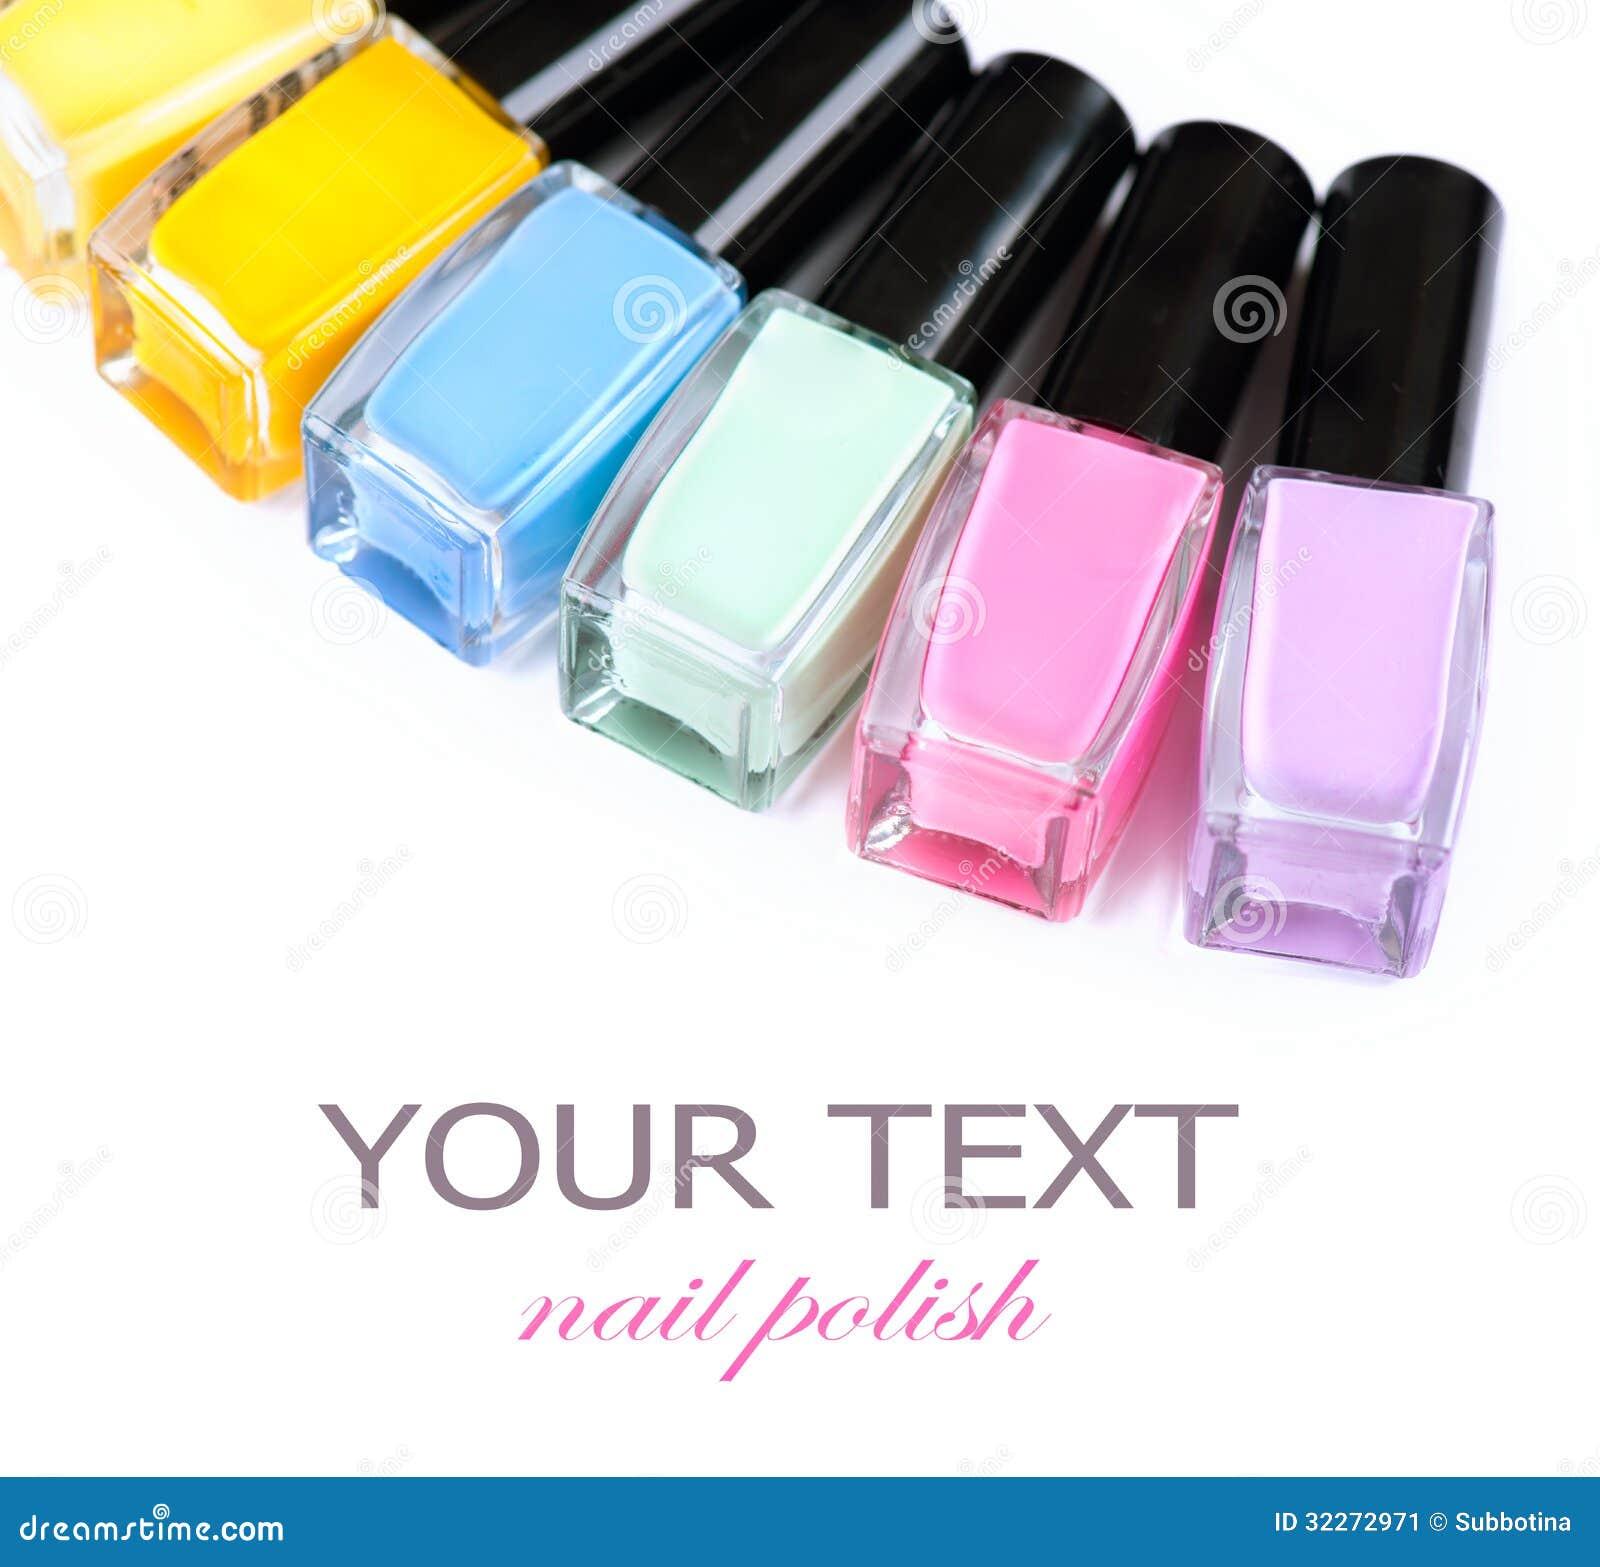 Colorful Nail Polish Bottles Stock Photo 32272971 - Megapixl